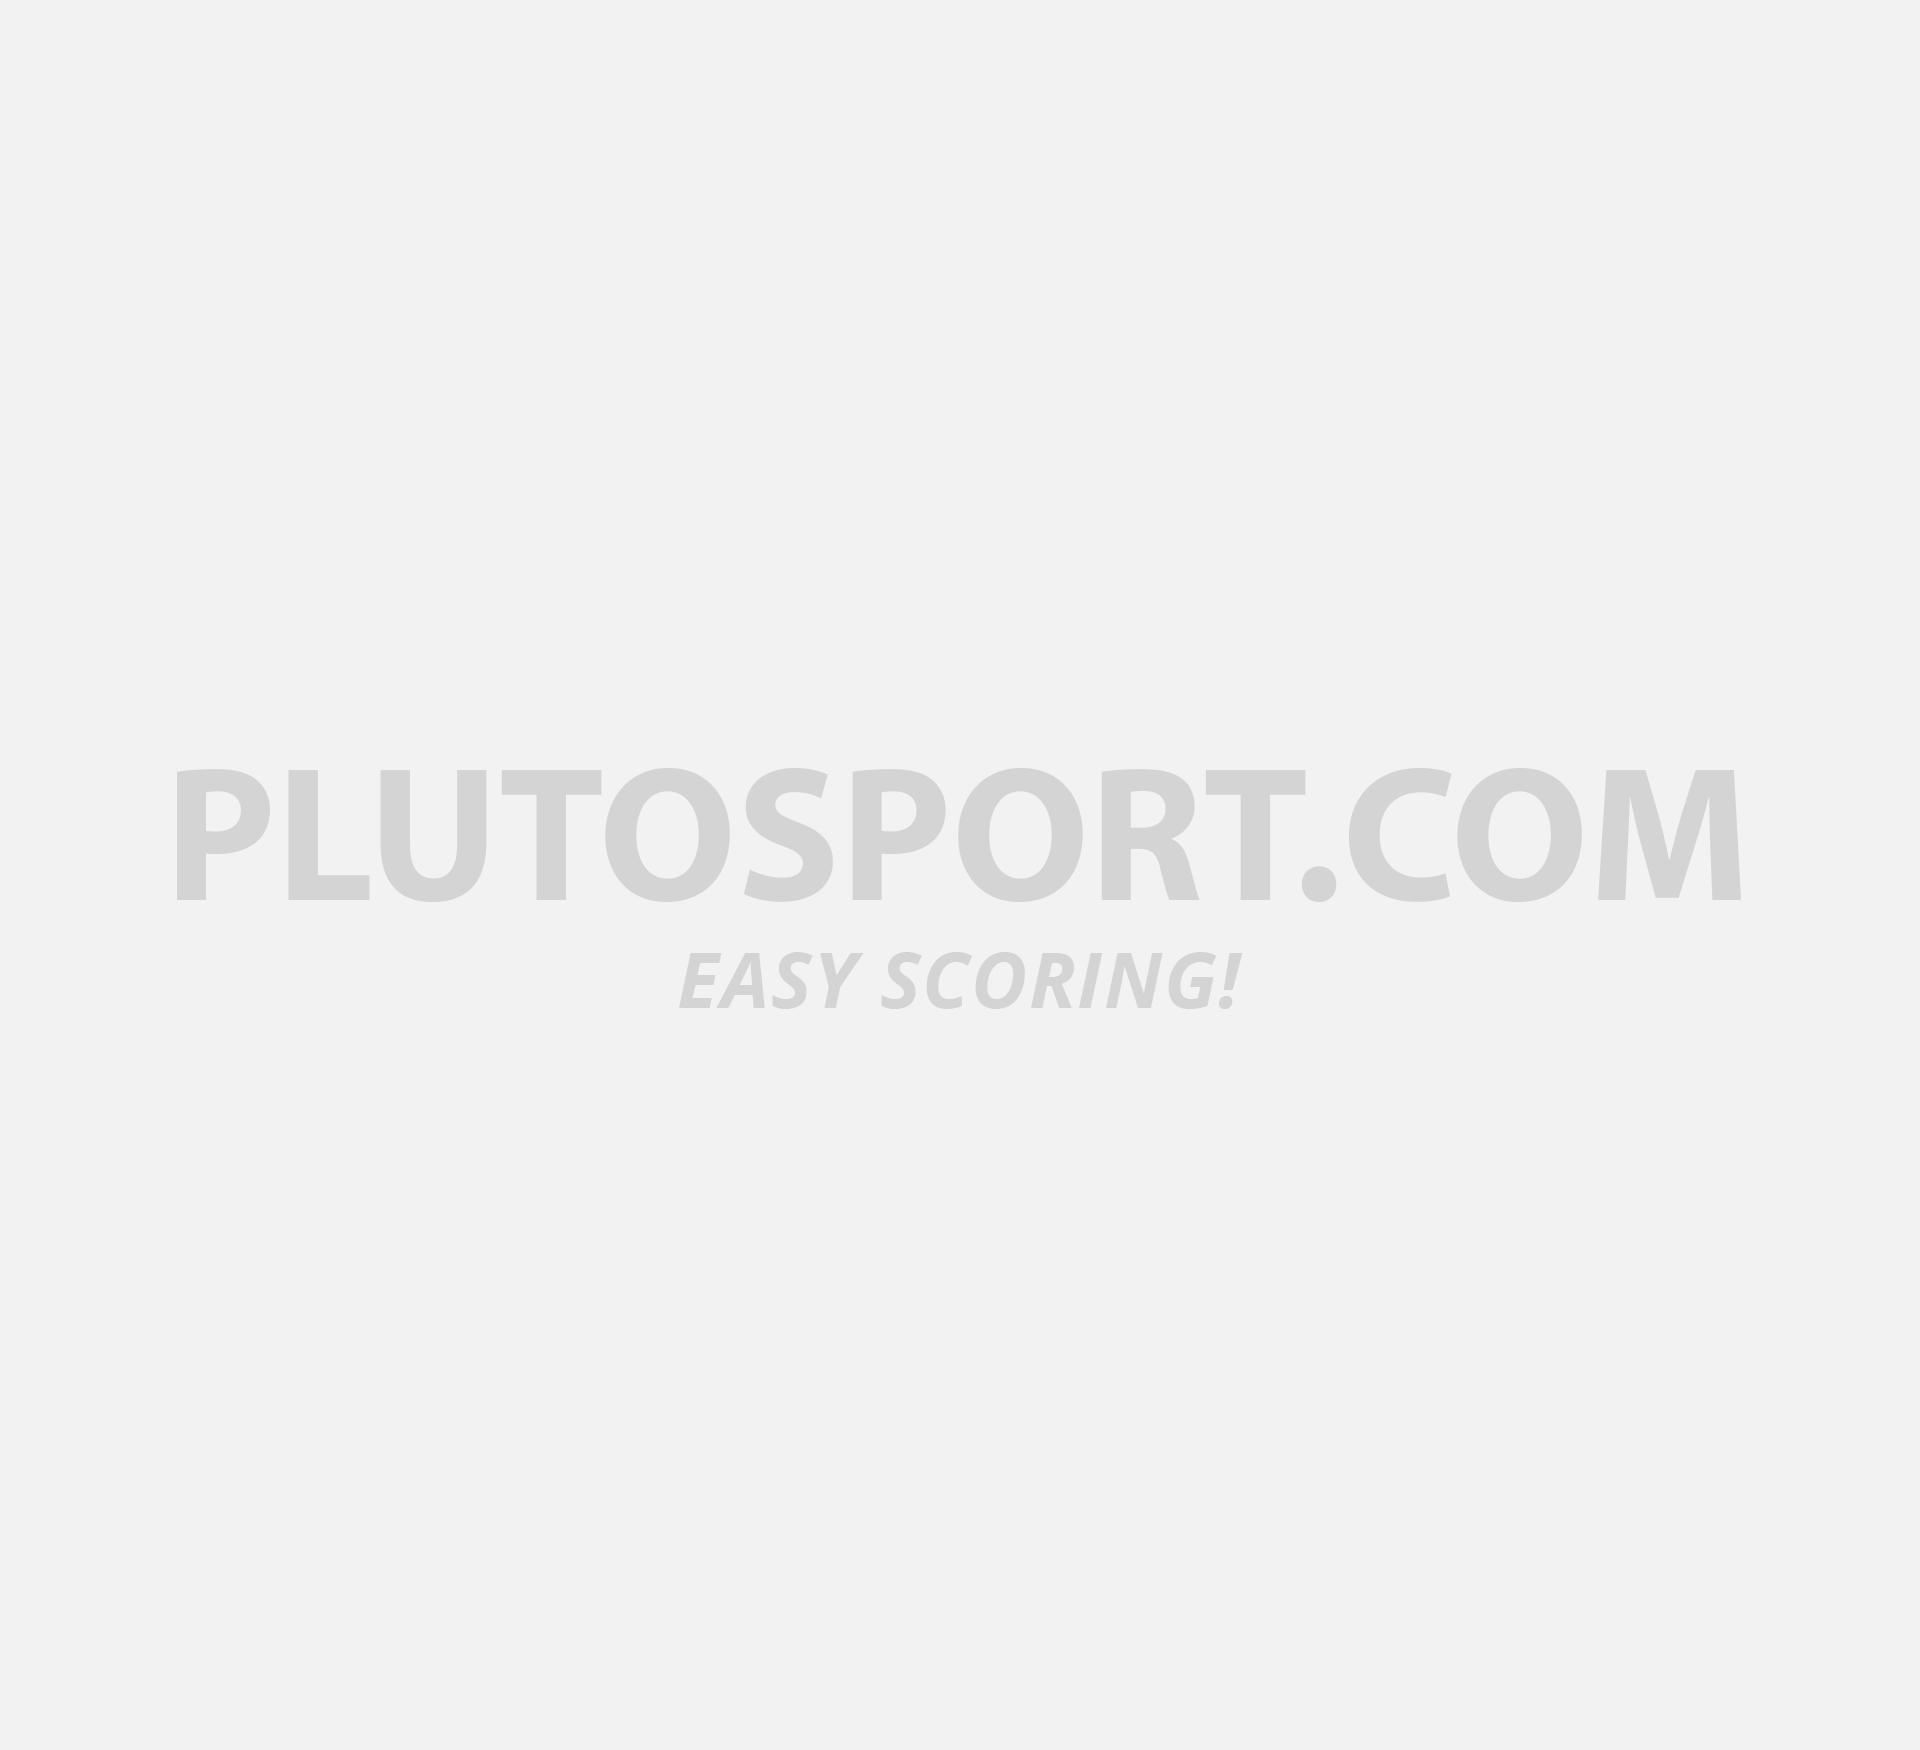 8b39549069 Roxy Jetty Snowboard Jacket Junior - Winter jackets - Jackets - Clothing -  Lifestyle - Sports | Plutosport